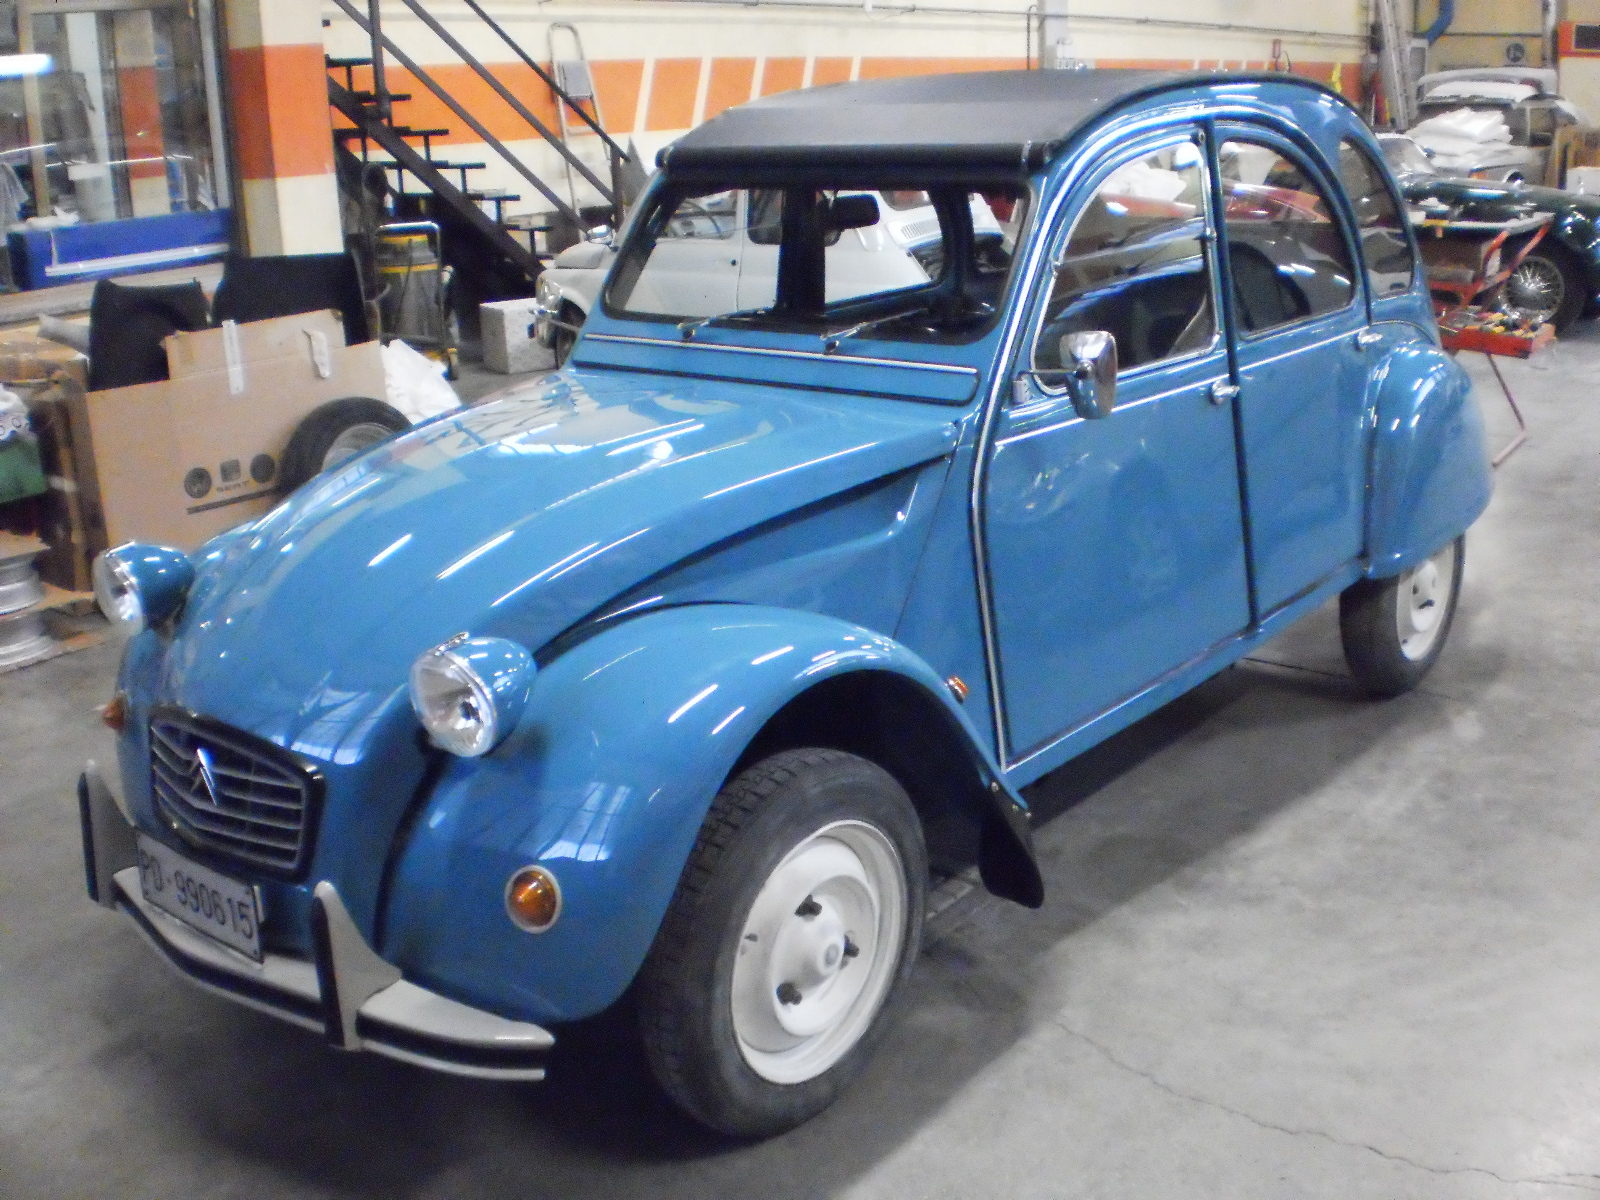 restauro auto d'epoca 2 cv carrozzeria brescia 5